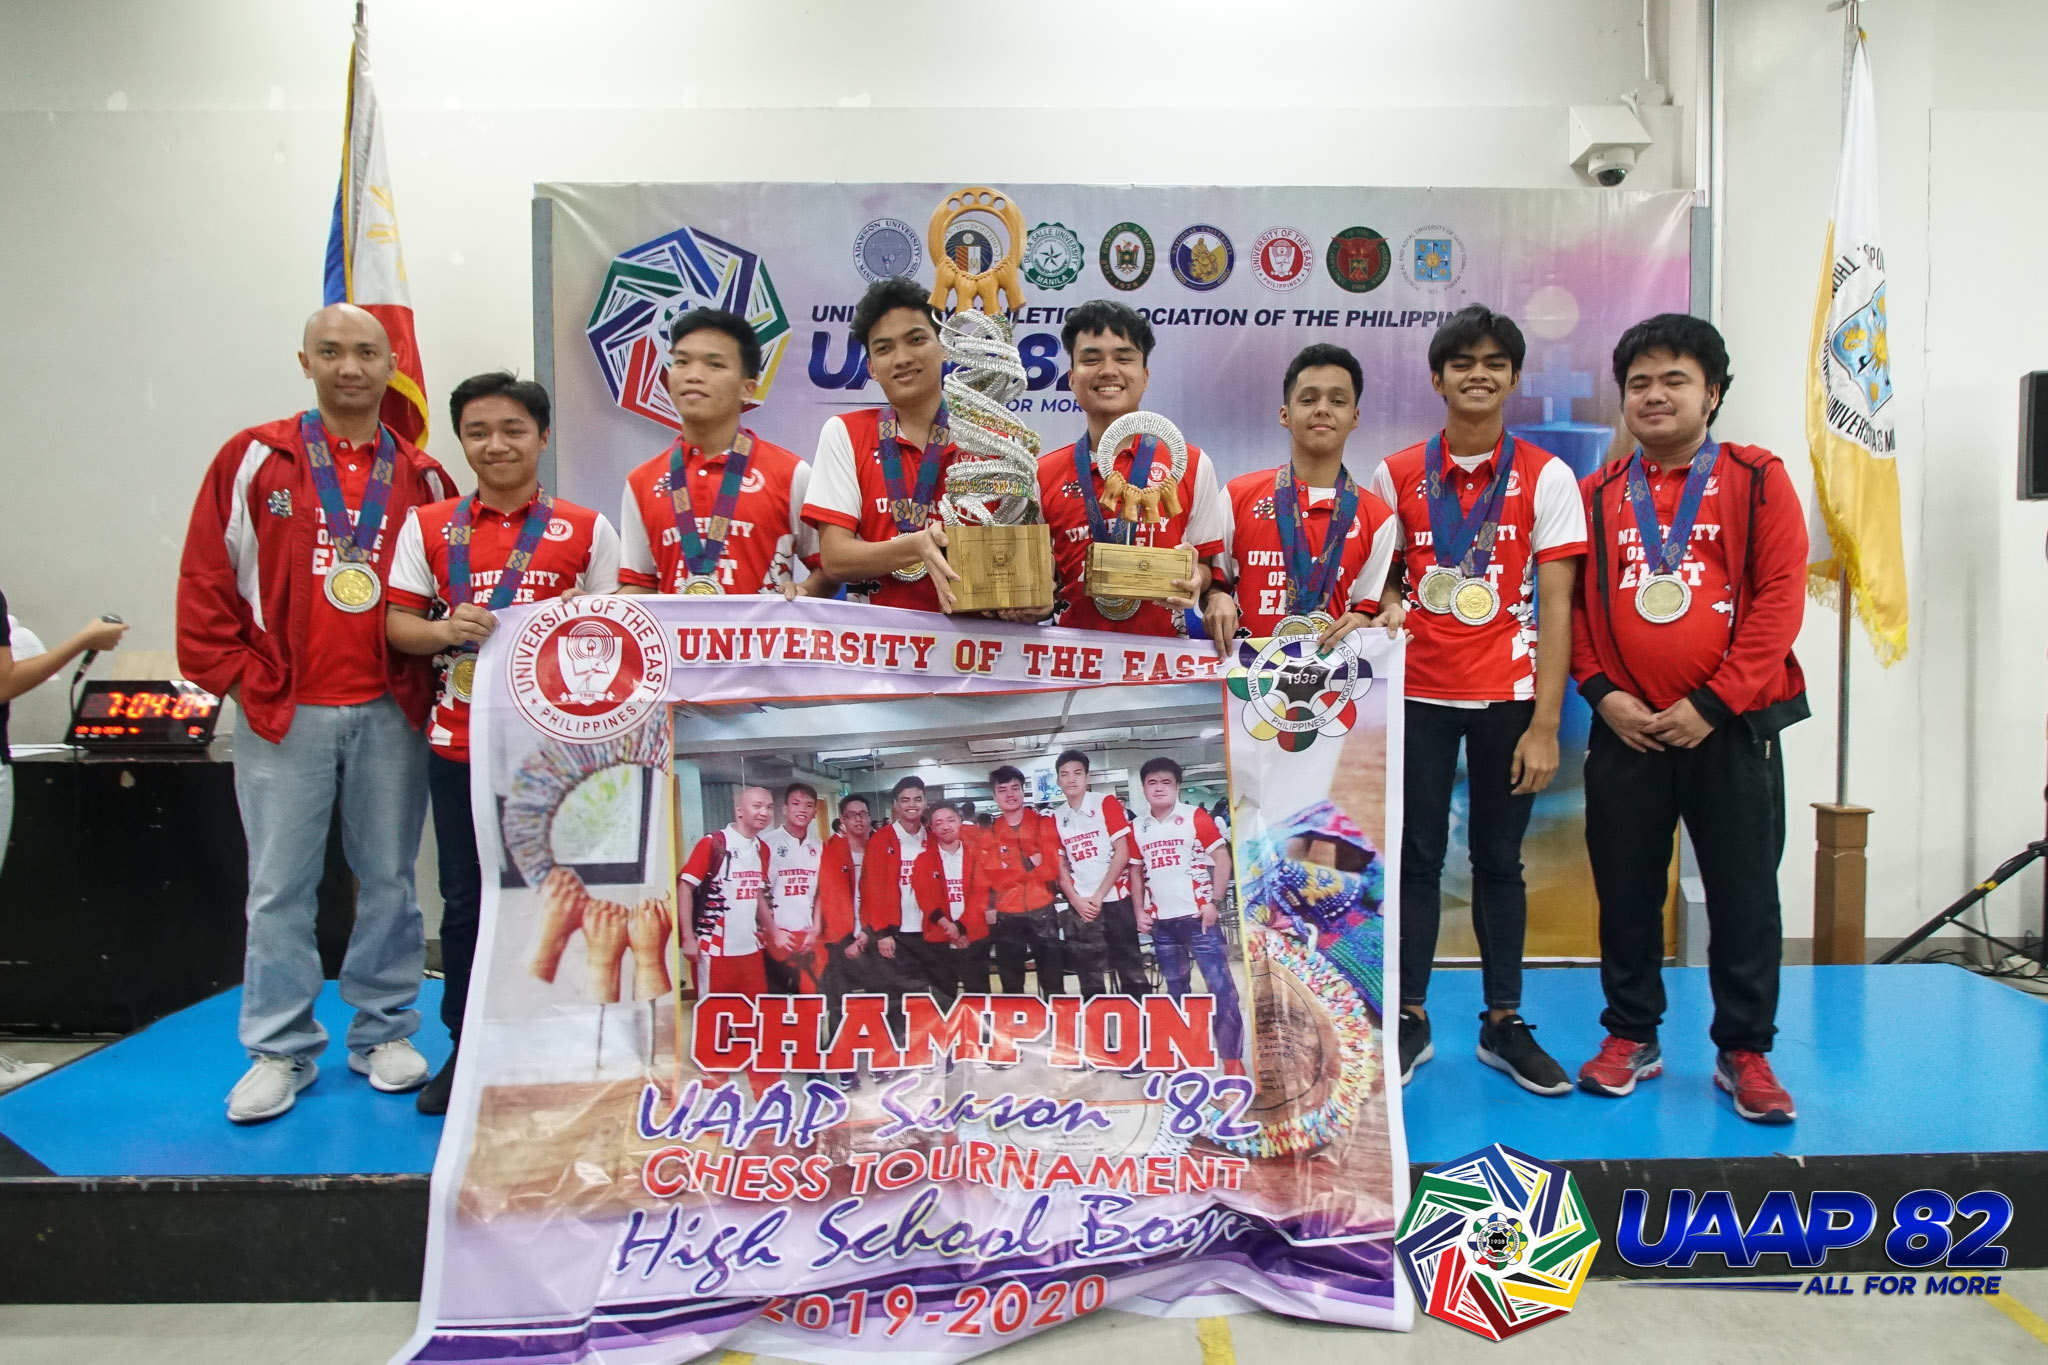 UAAP-82-Boys-Chess-Awarding-8-champion-UE NU overtakes FEU to take UAAP Girls' Chess crown, UE Boys' ends 13-year drought ADMU AdU Chess DLSU FEU News NU UAAP UE UST  - philippine sports news